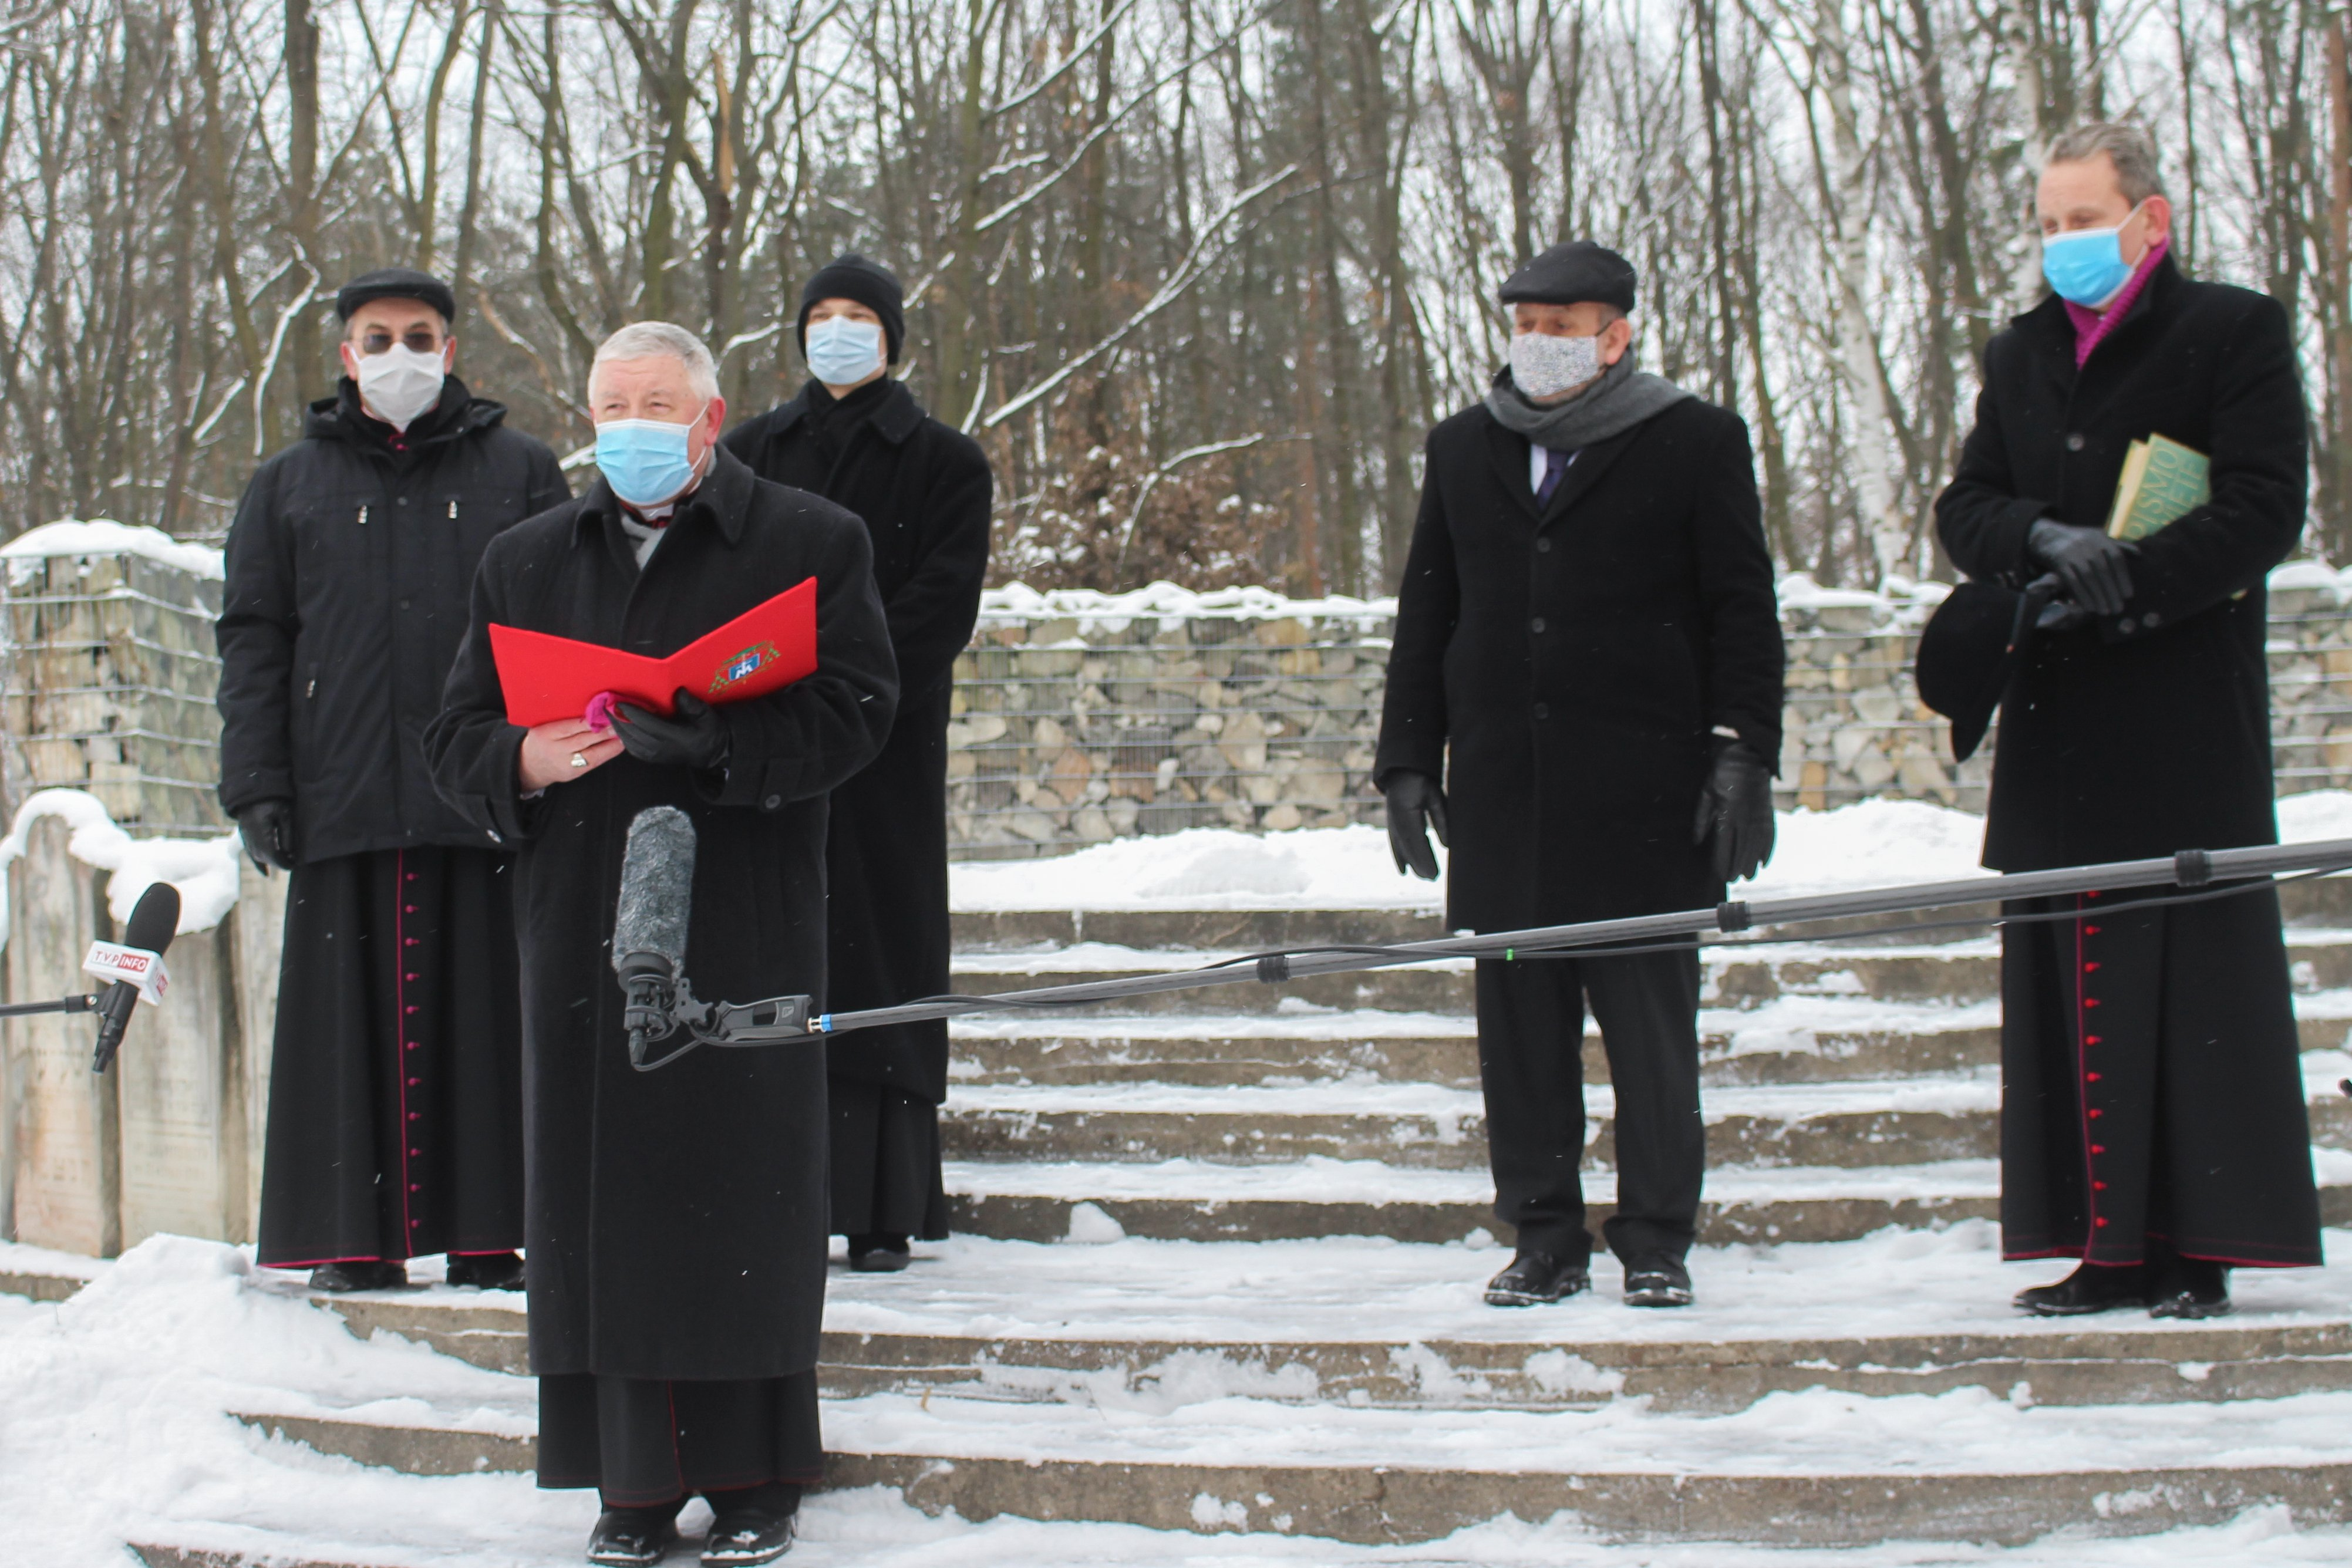 2021-01-17-cmentarz-brudnowski-modlitwa.jpg